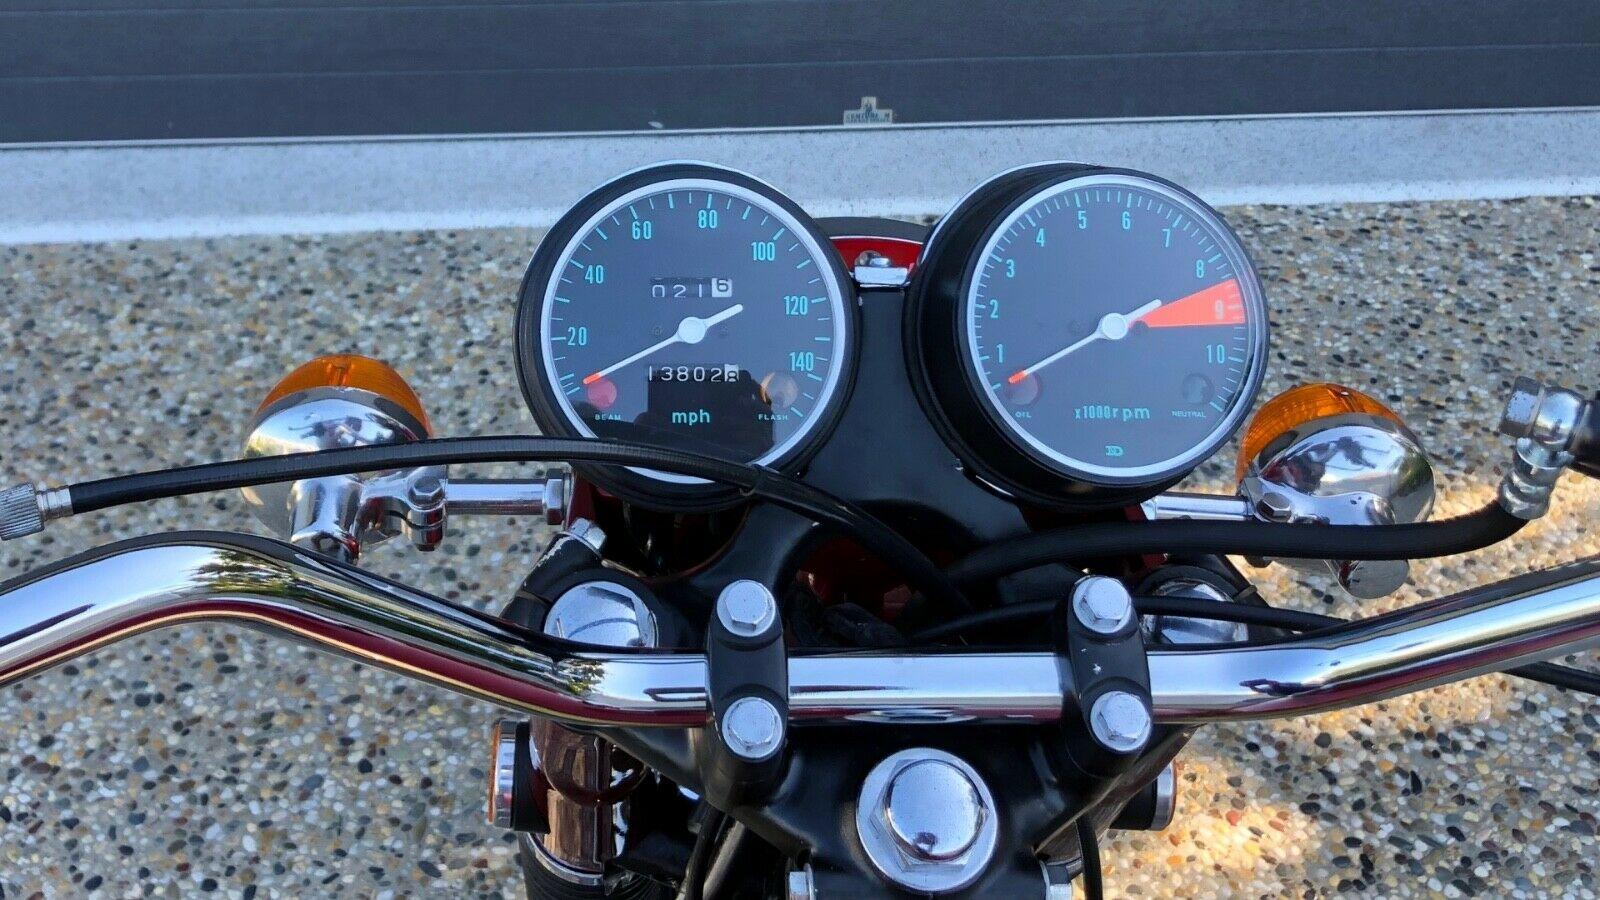 1969 Honda CB750 Sandcast K0 gauges